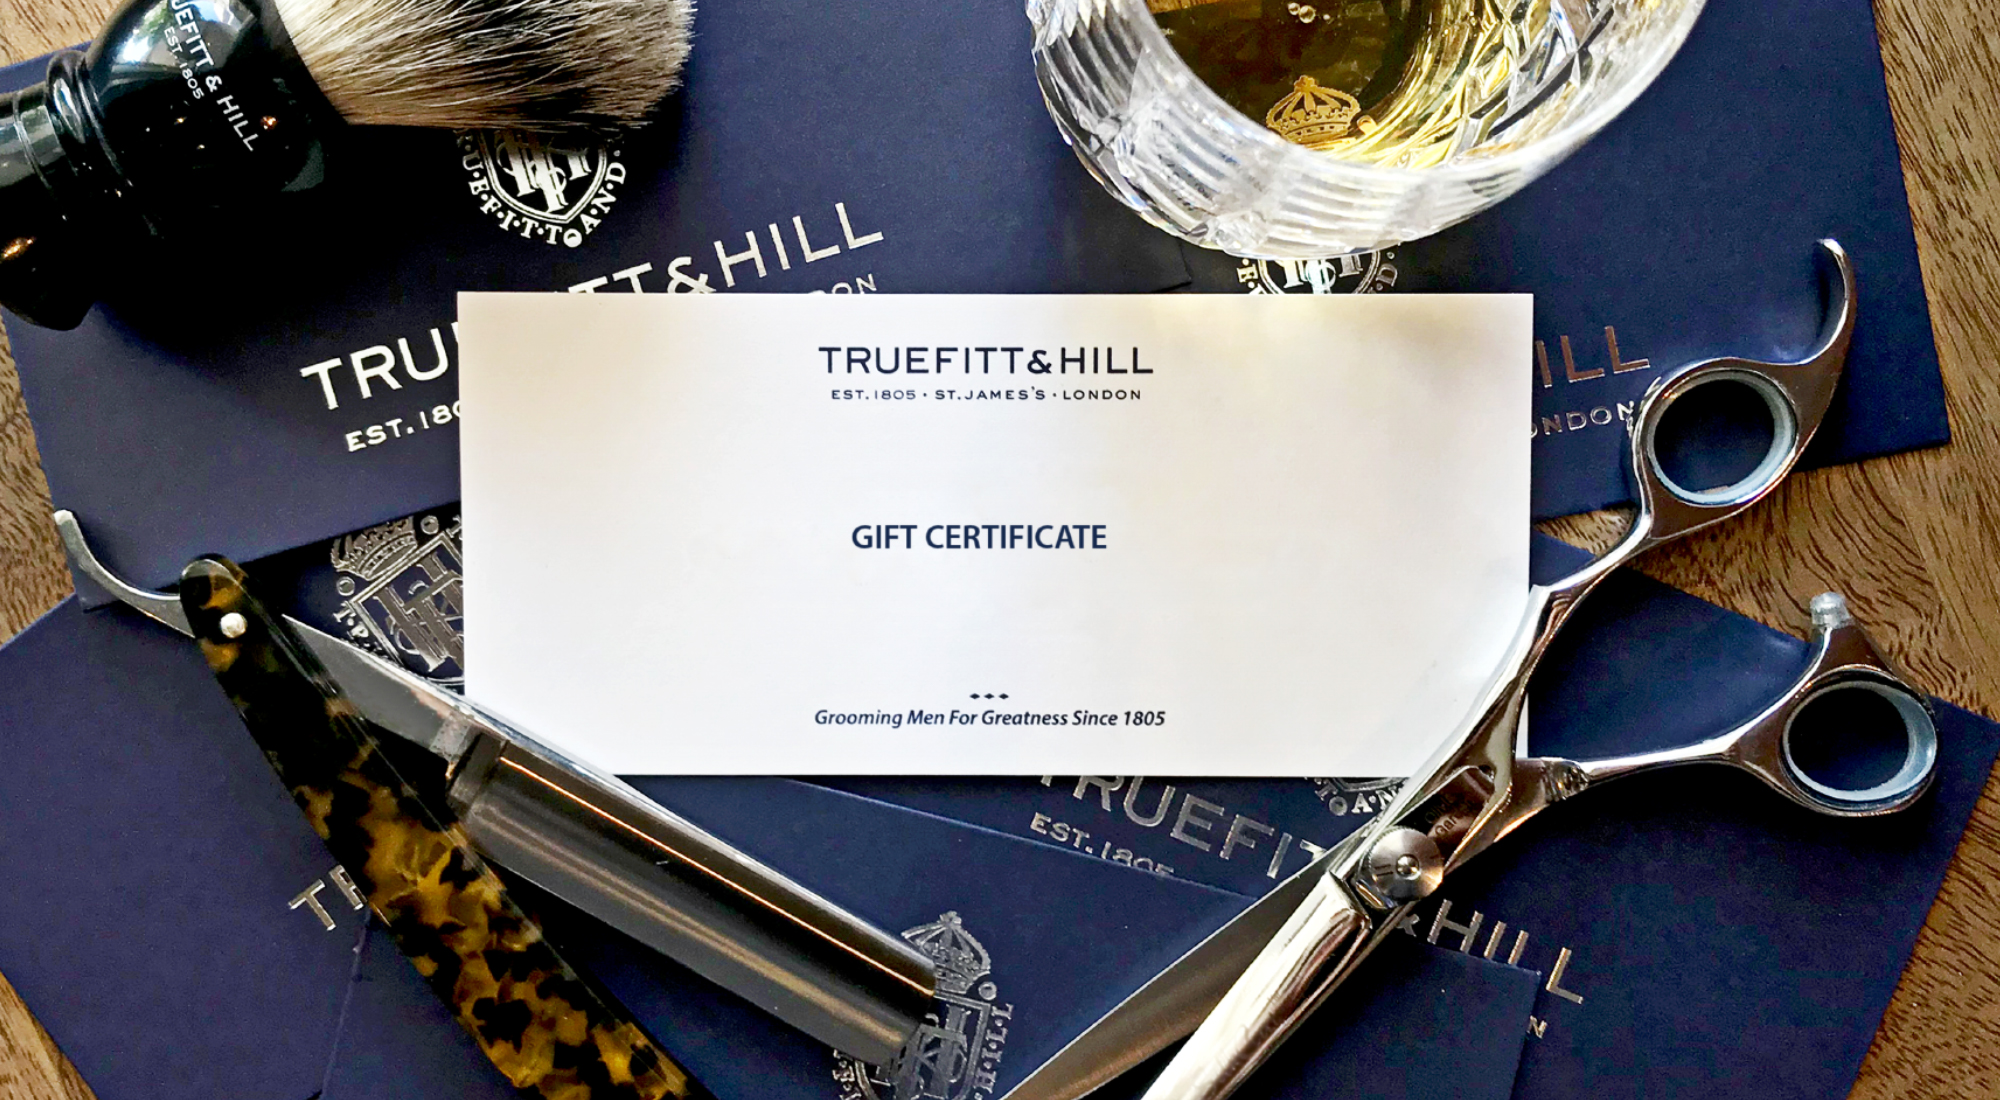 Truefitt & Hill January 2021 Offer